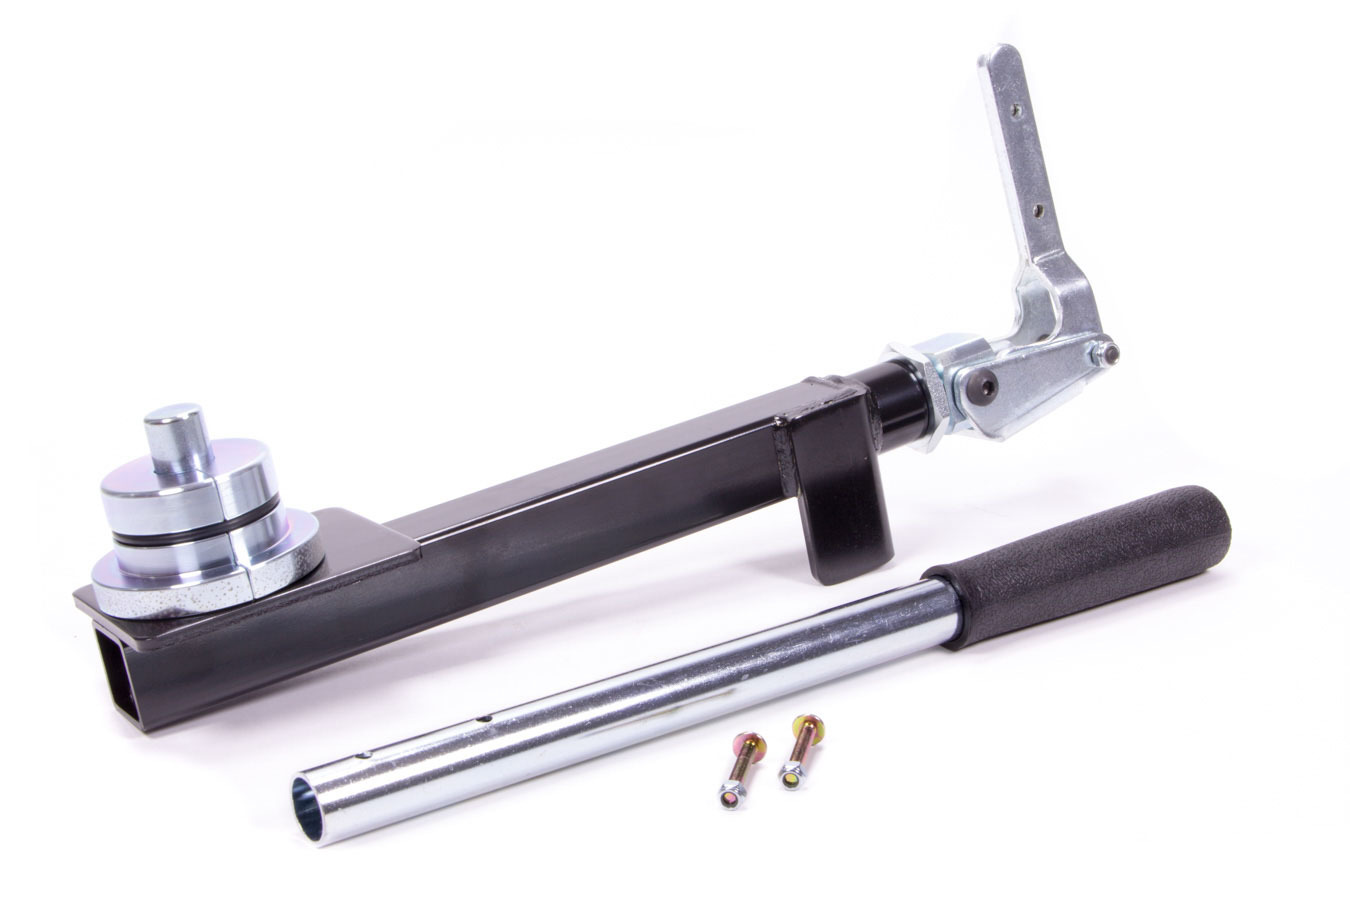 Proform 66773 Connecting Rod Splitter, Heavy Duty, Each